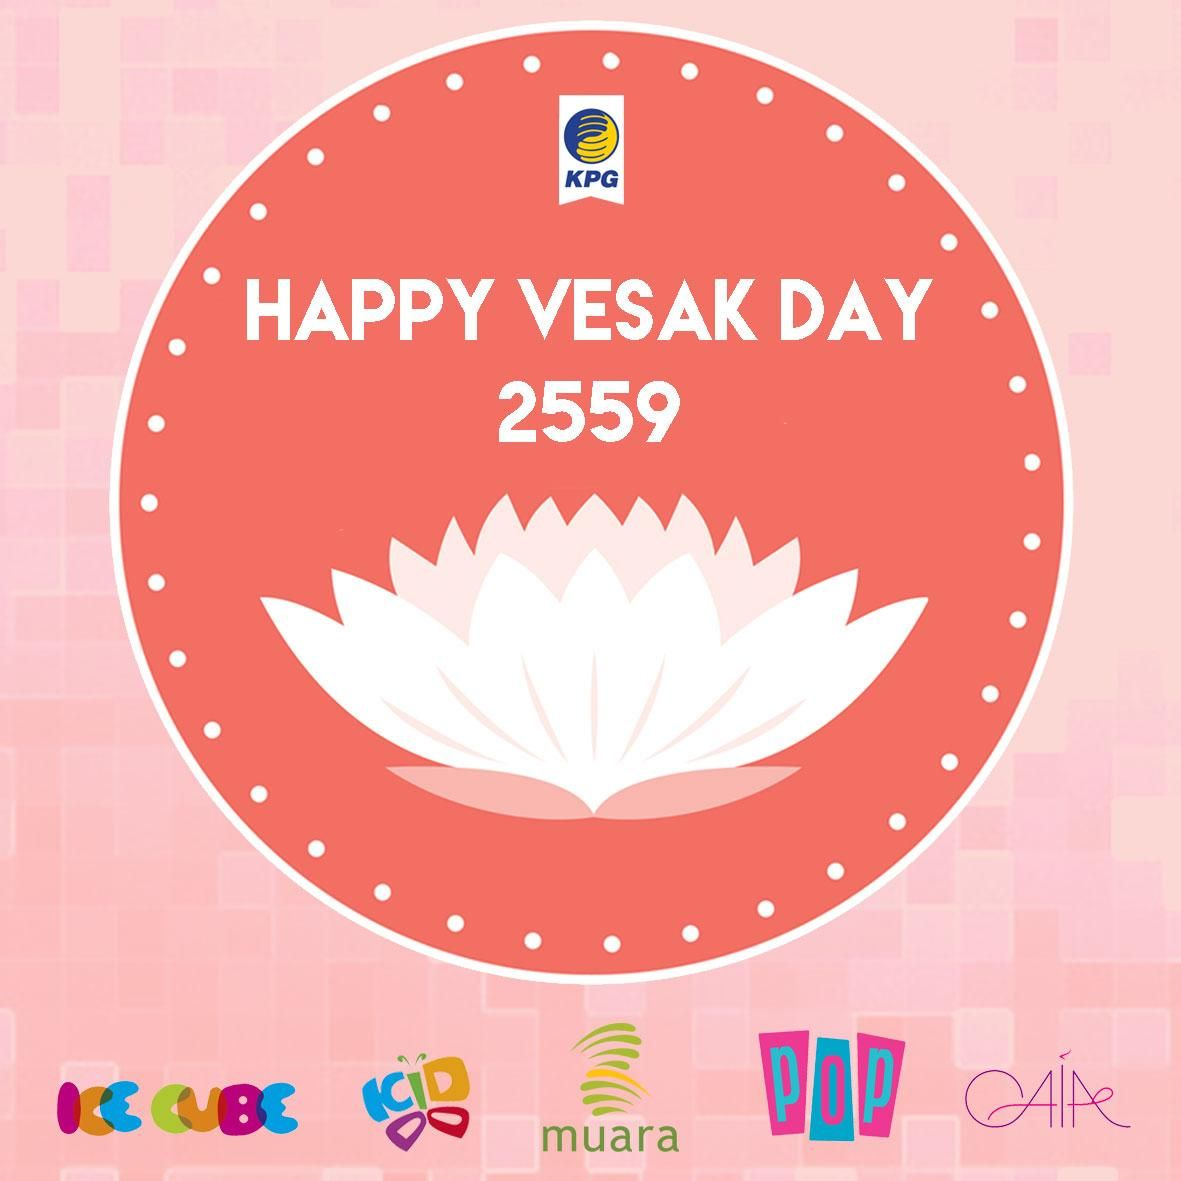 Happy Vesak Day 2015 Greetings Pinterest India